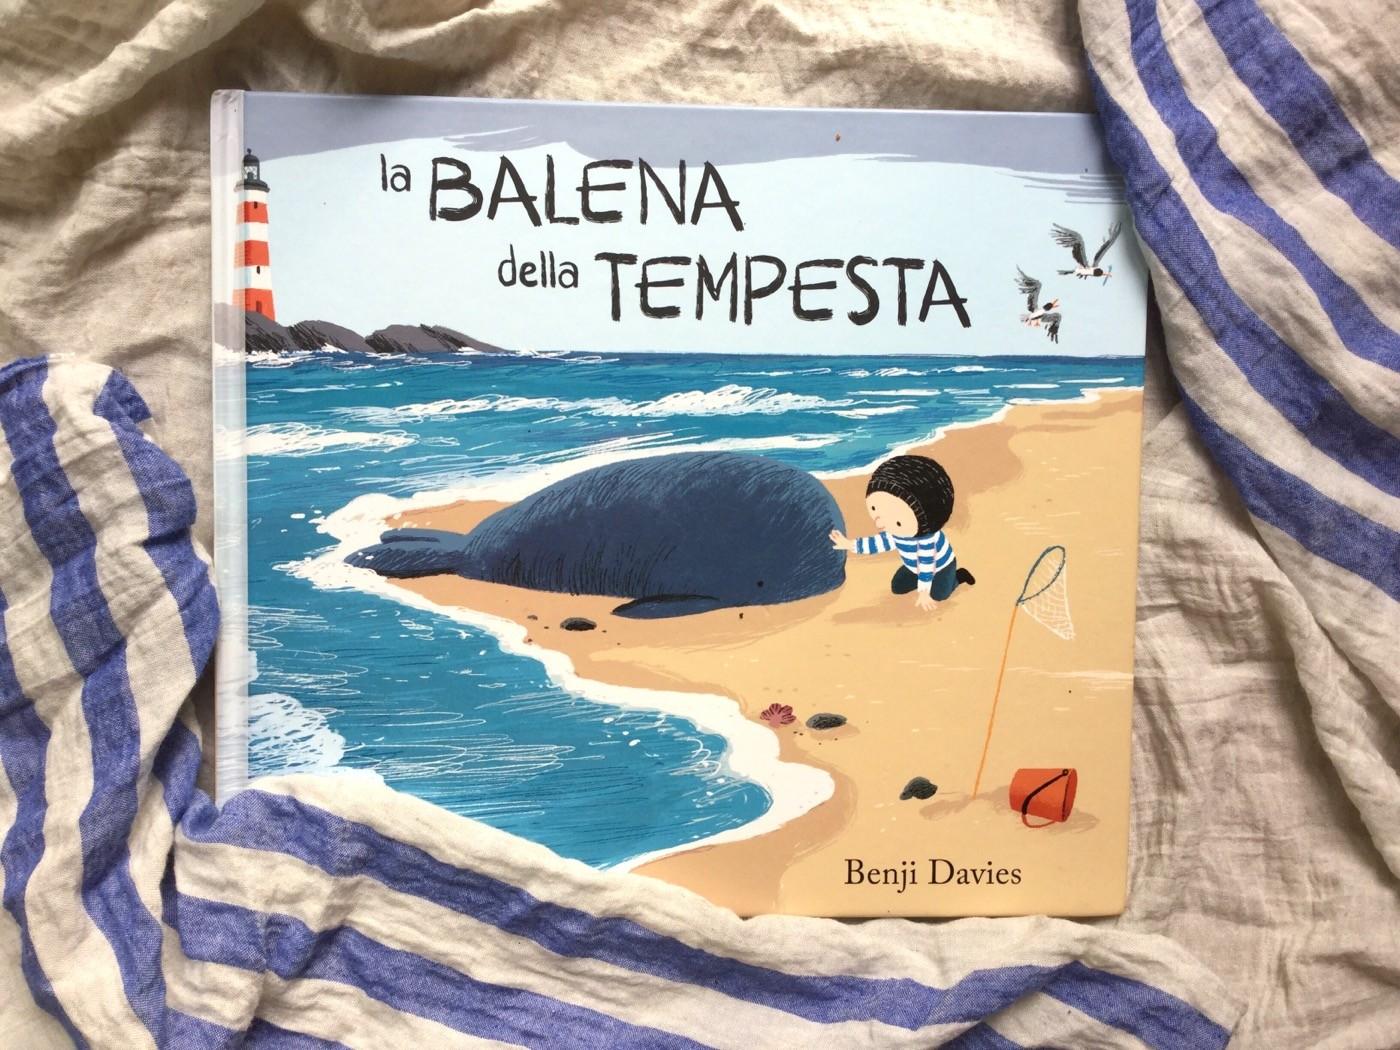 Balena-tempesta-benji-davies-edt-giralangolo-galline-volanti